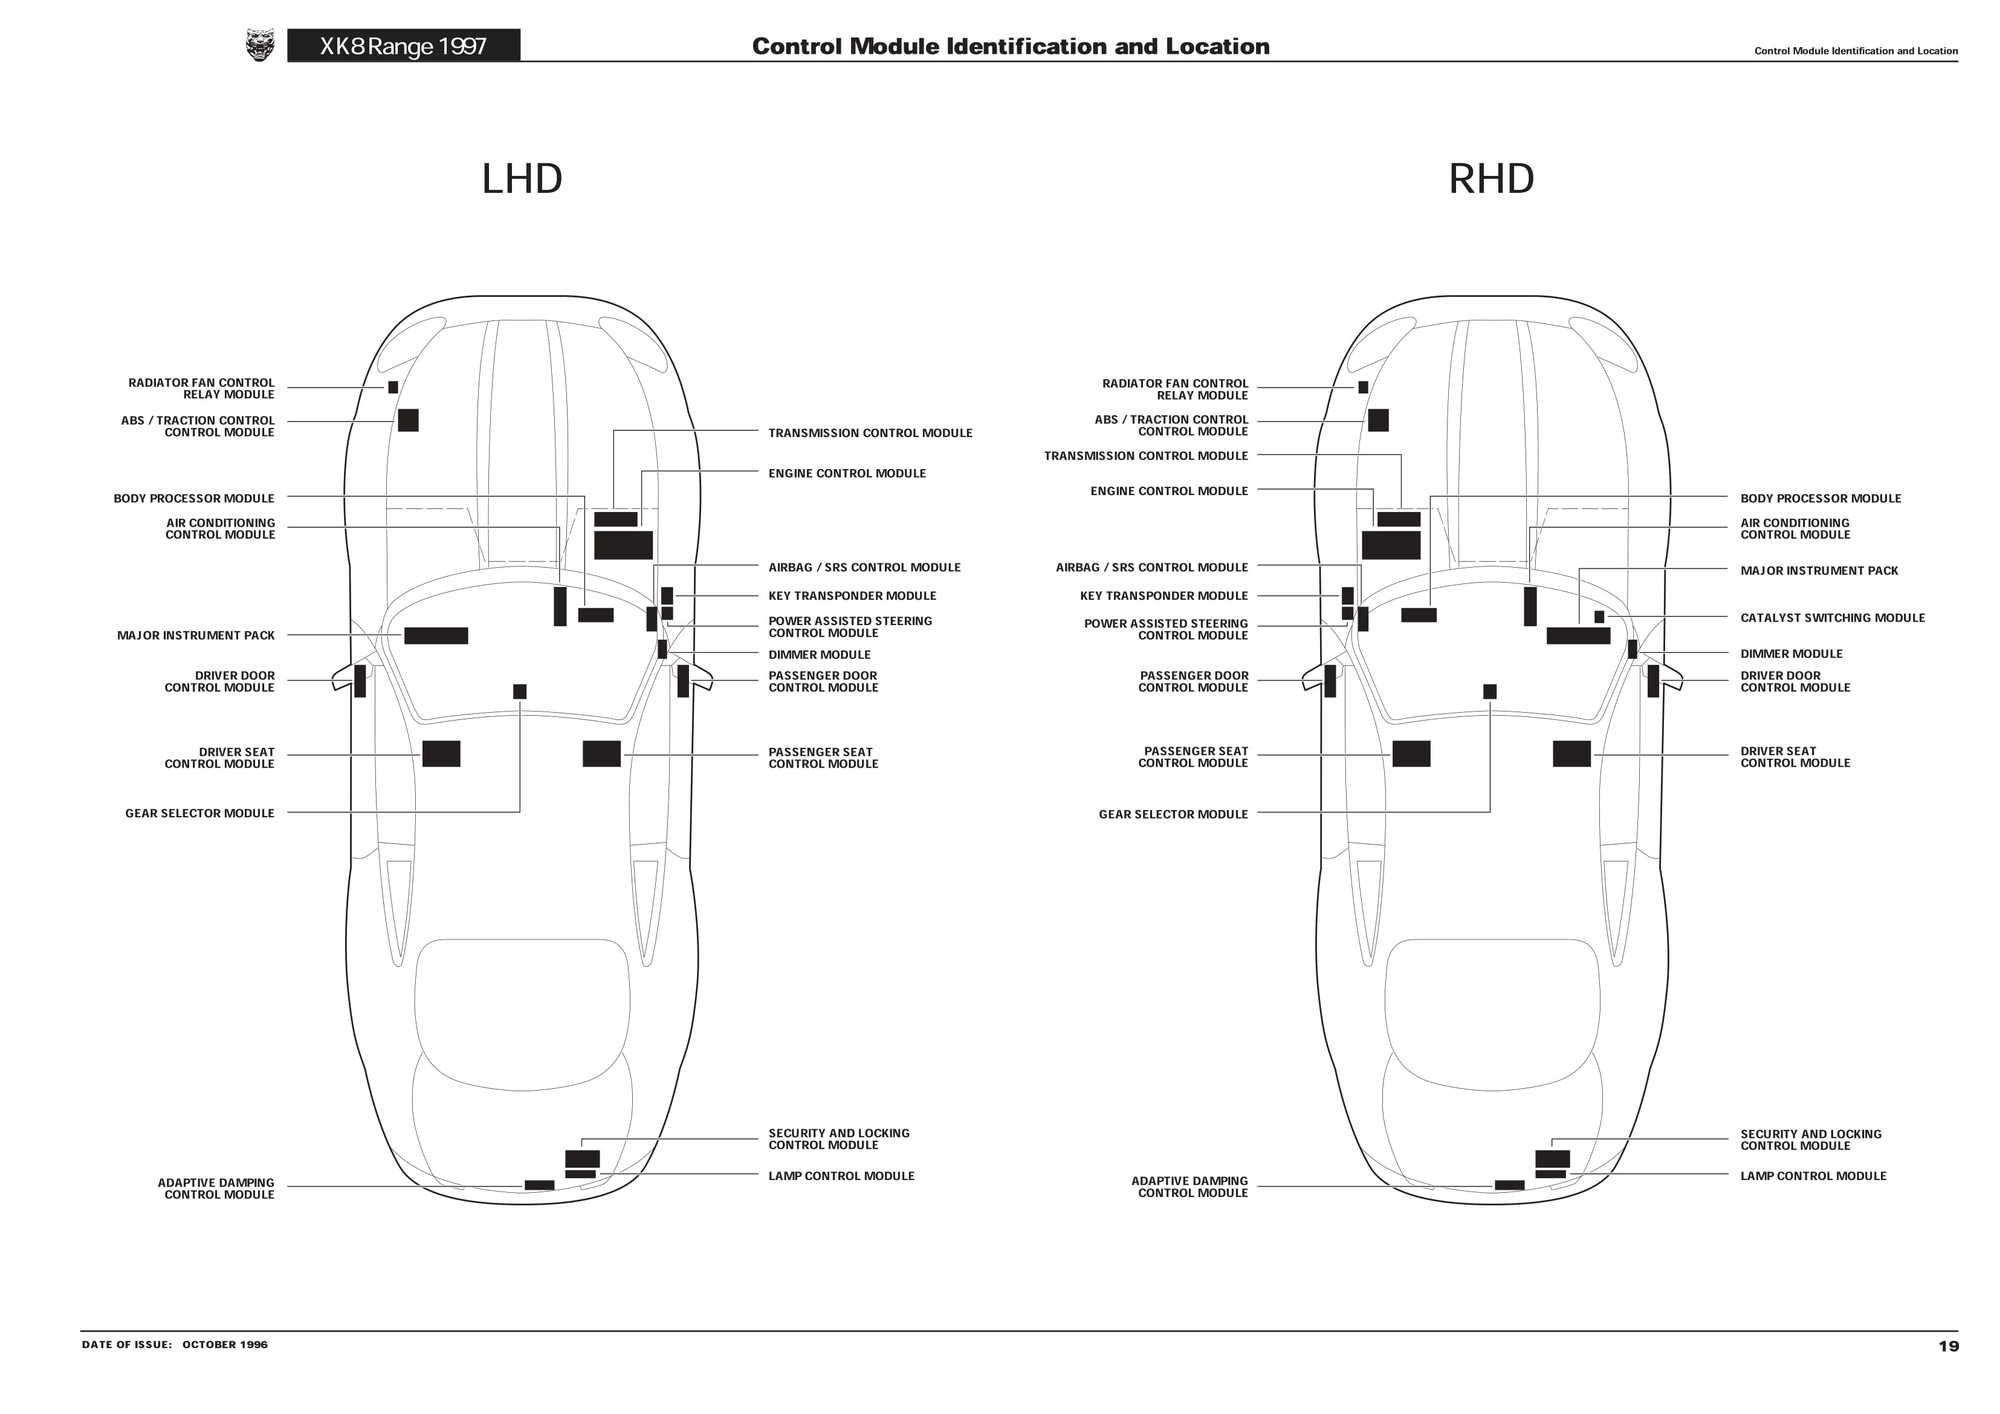 2004 Jaguar Xj8 Cooling System Diagram